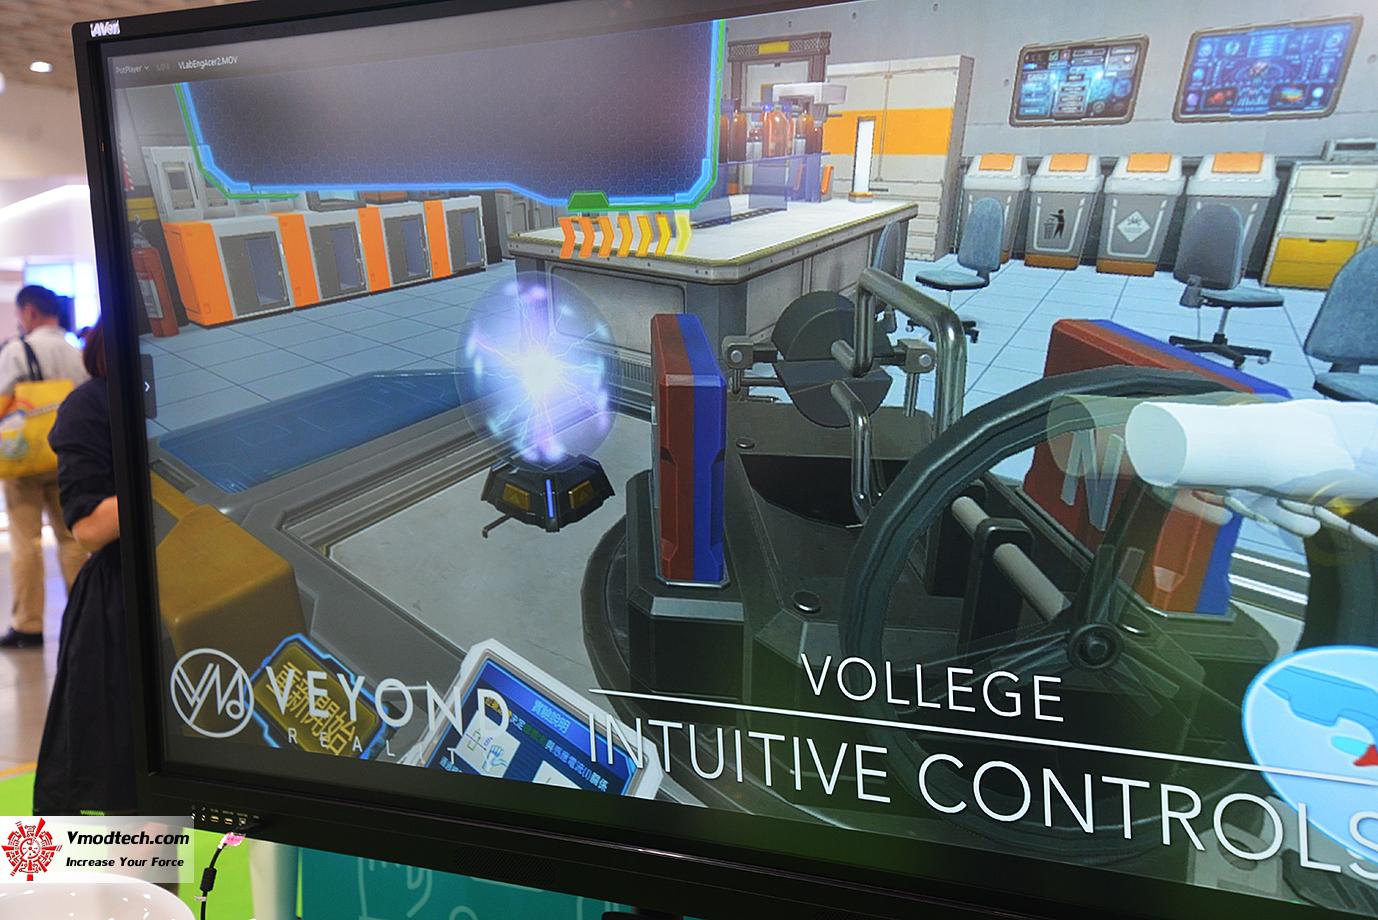 dsc 8613 เยี่ยมชมบูธ Smart Education ระบบการศึกษาอัจฉริยะในงาน 2019 SMART CITY SUMMIT & EXPO ณ กรุงไทเป ประเทศไต้หวัน